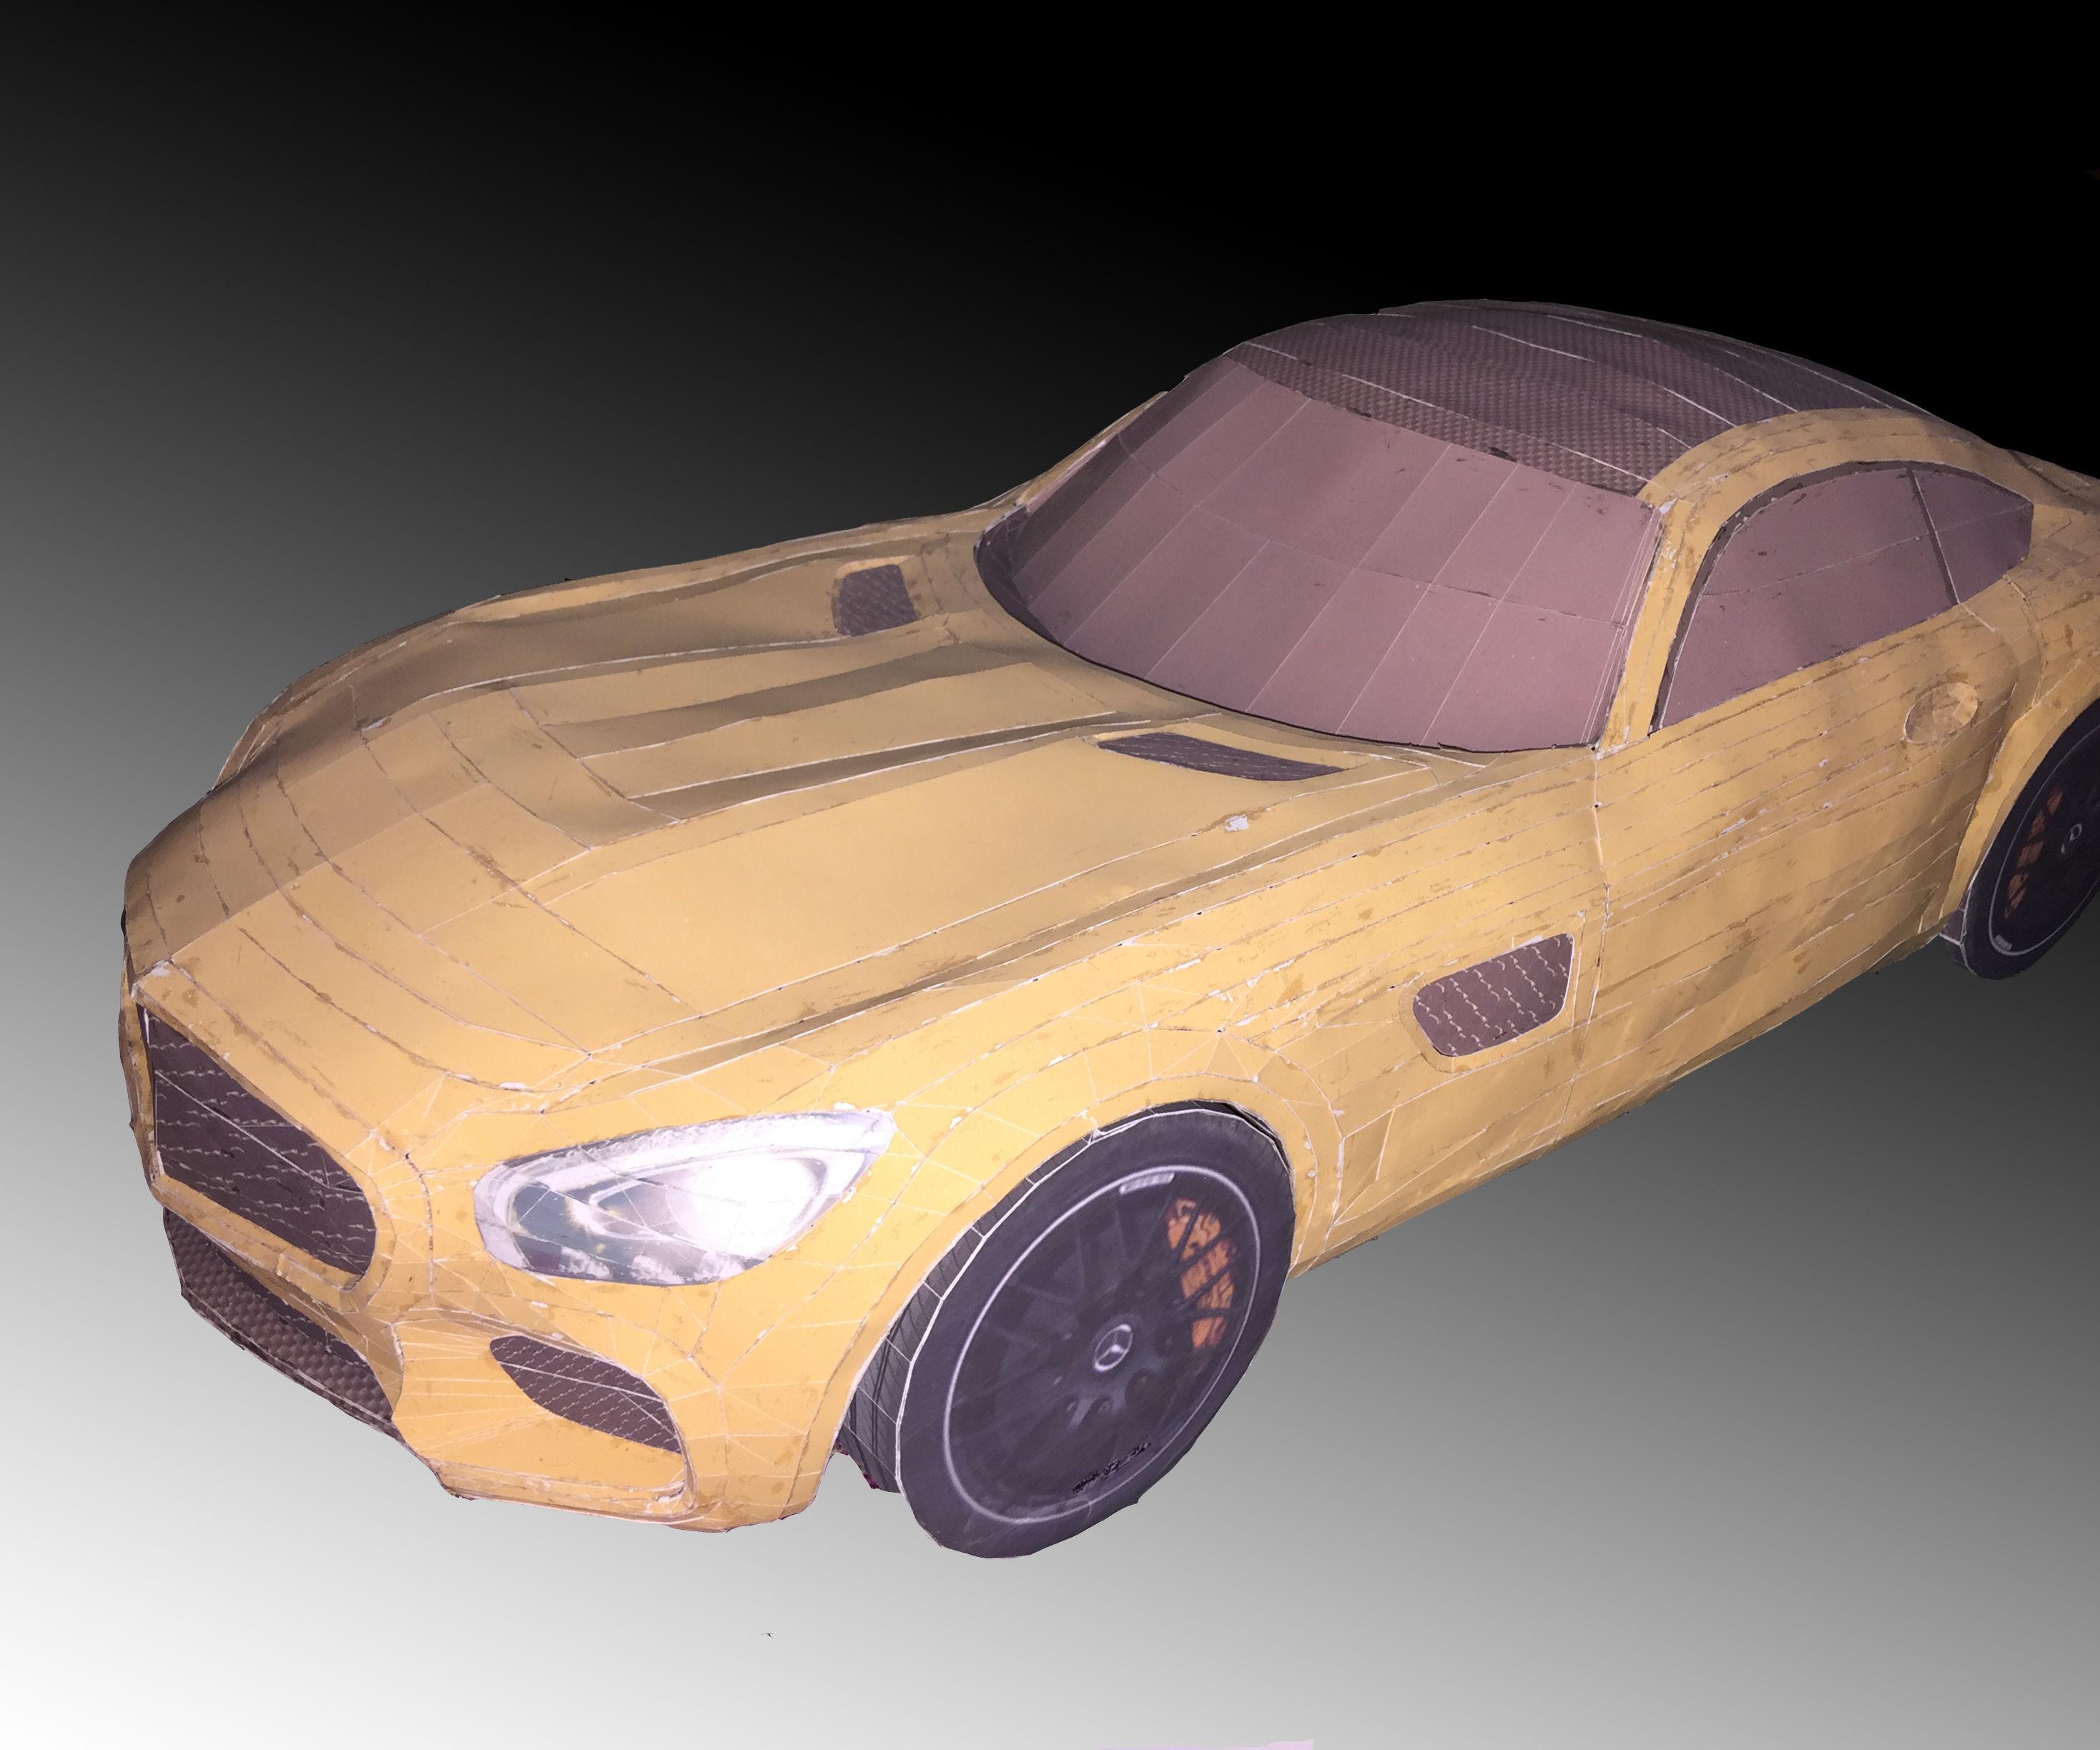 AMG GT PAPERCRAFT